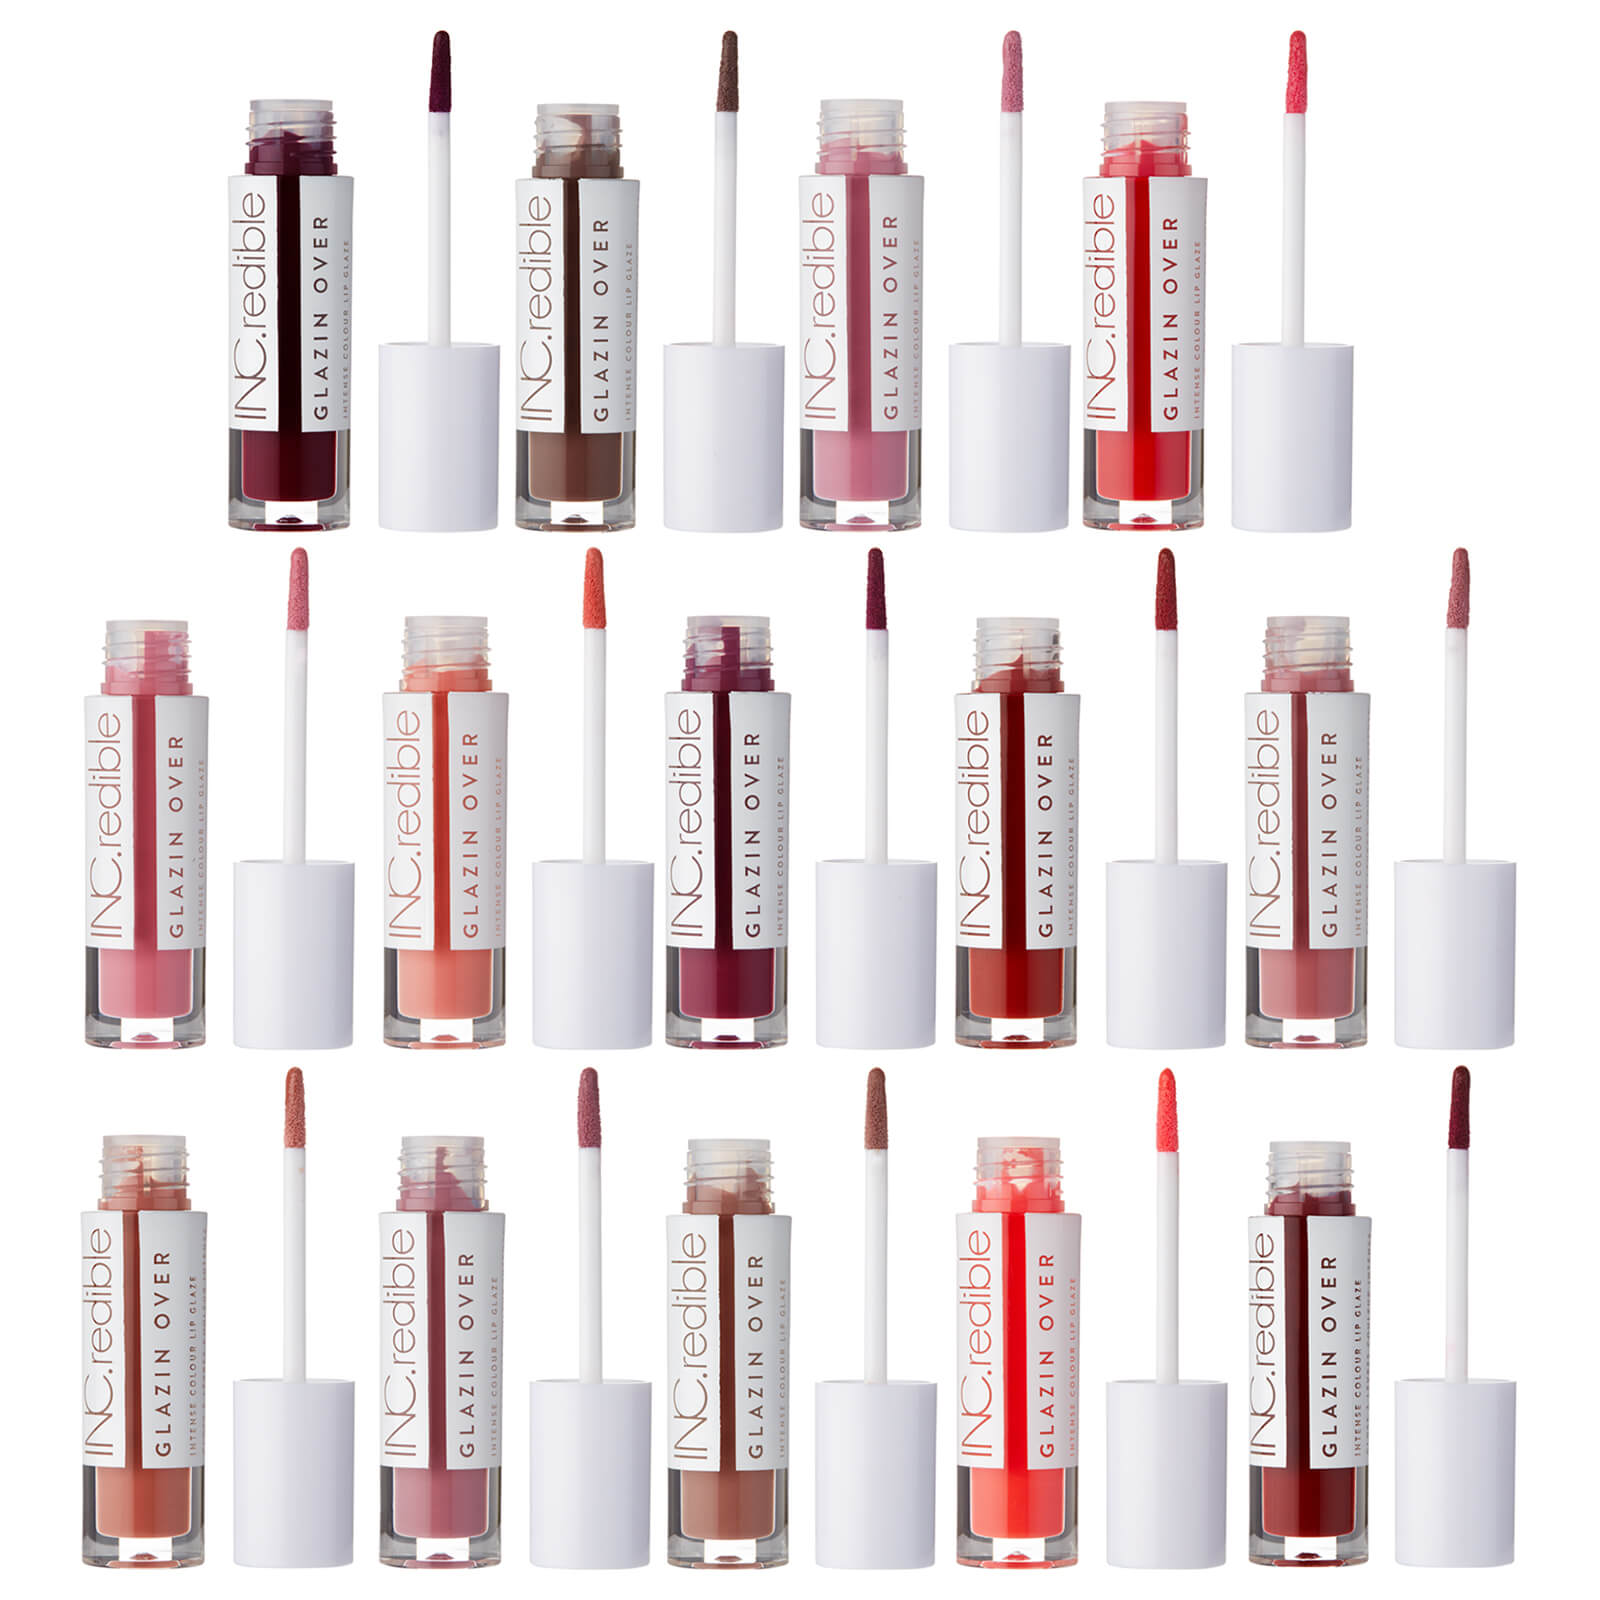 Inc Redible Glazin Over Lip Glaze Various Shades Free Us Shipping Lookfantastic